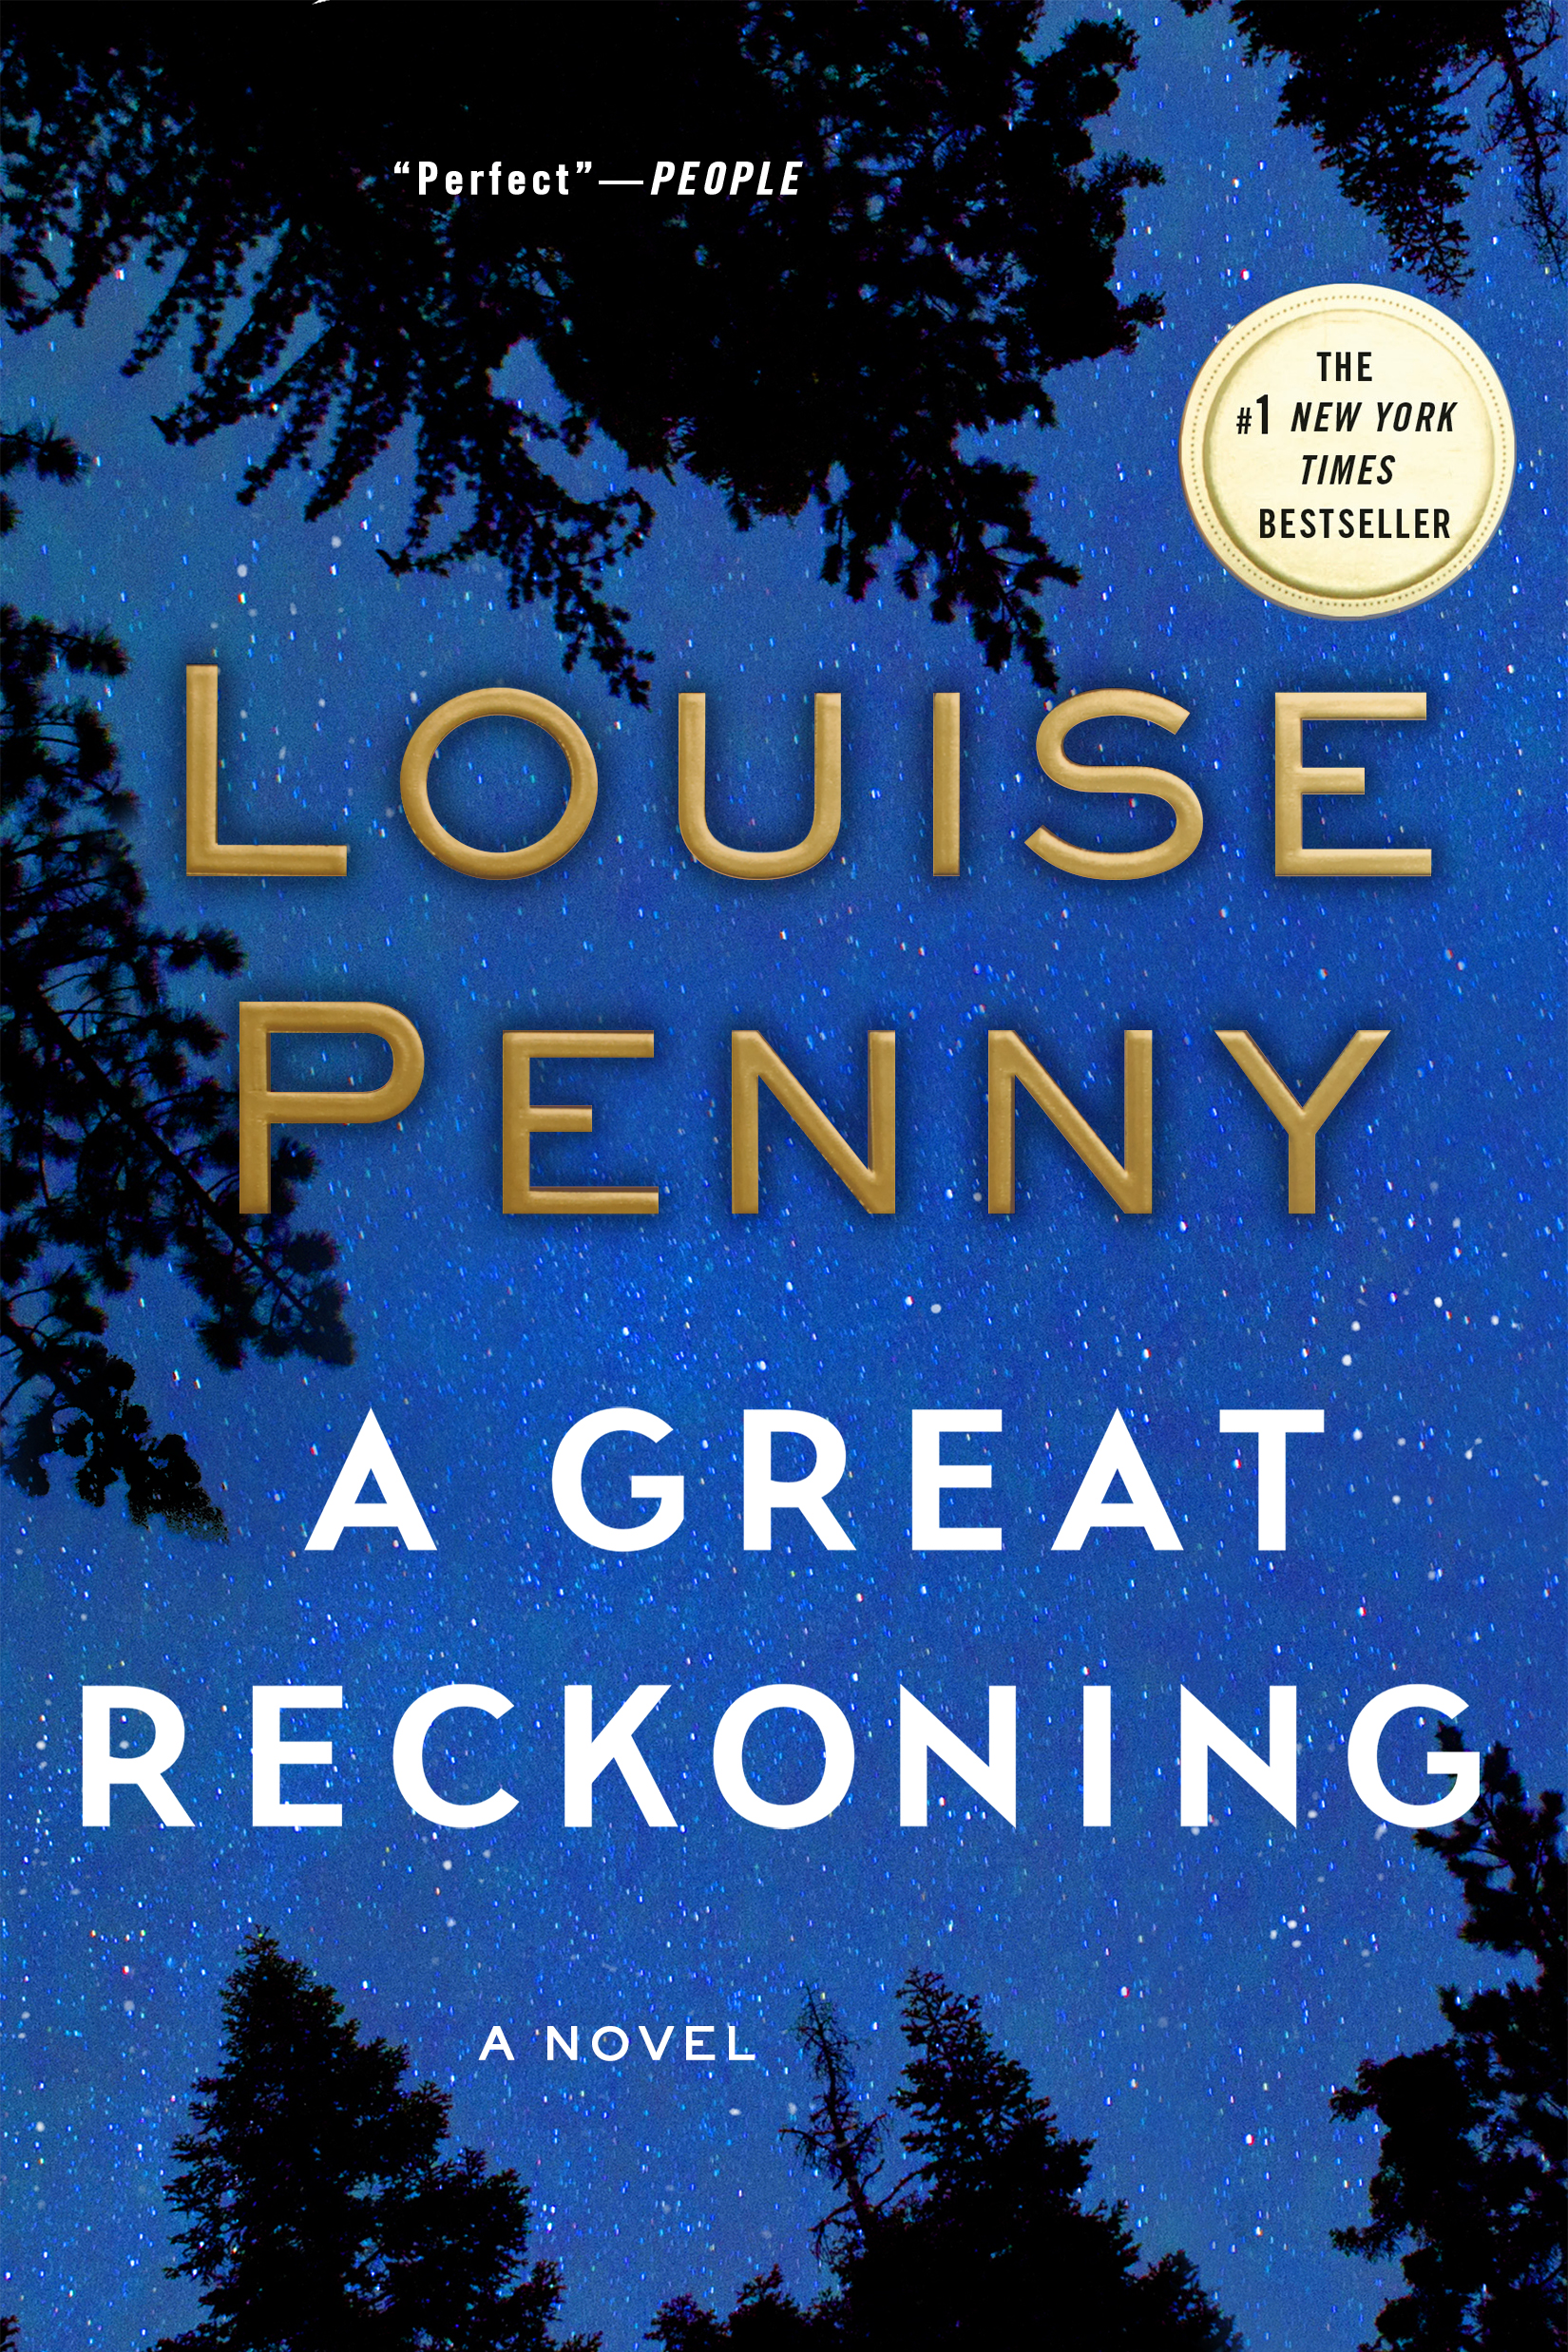 A Great Reckoning A Novel